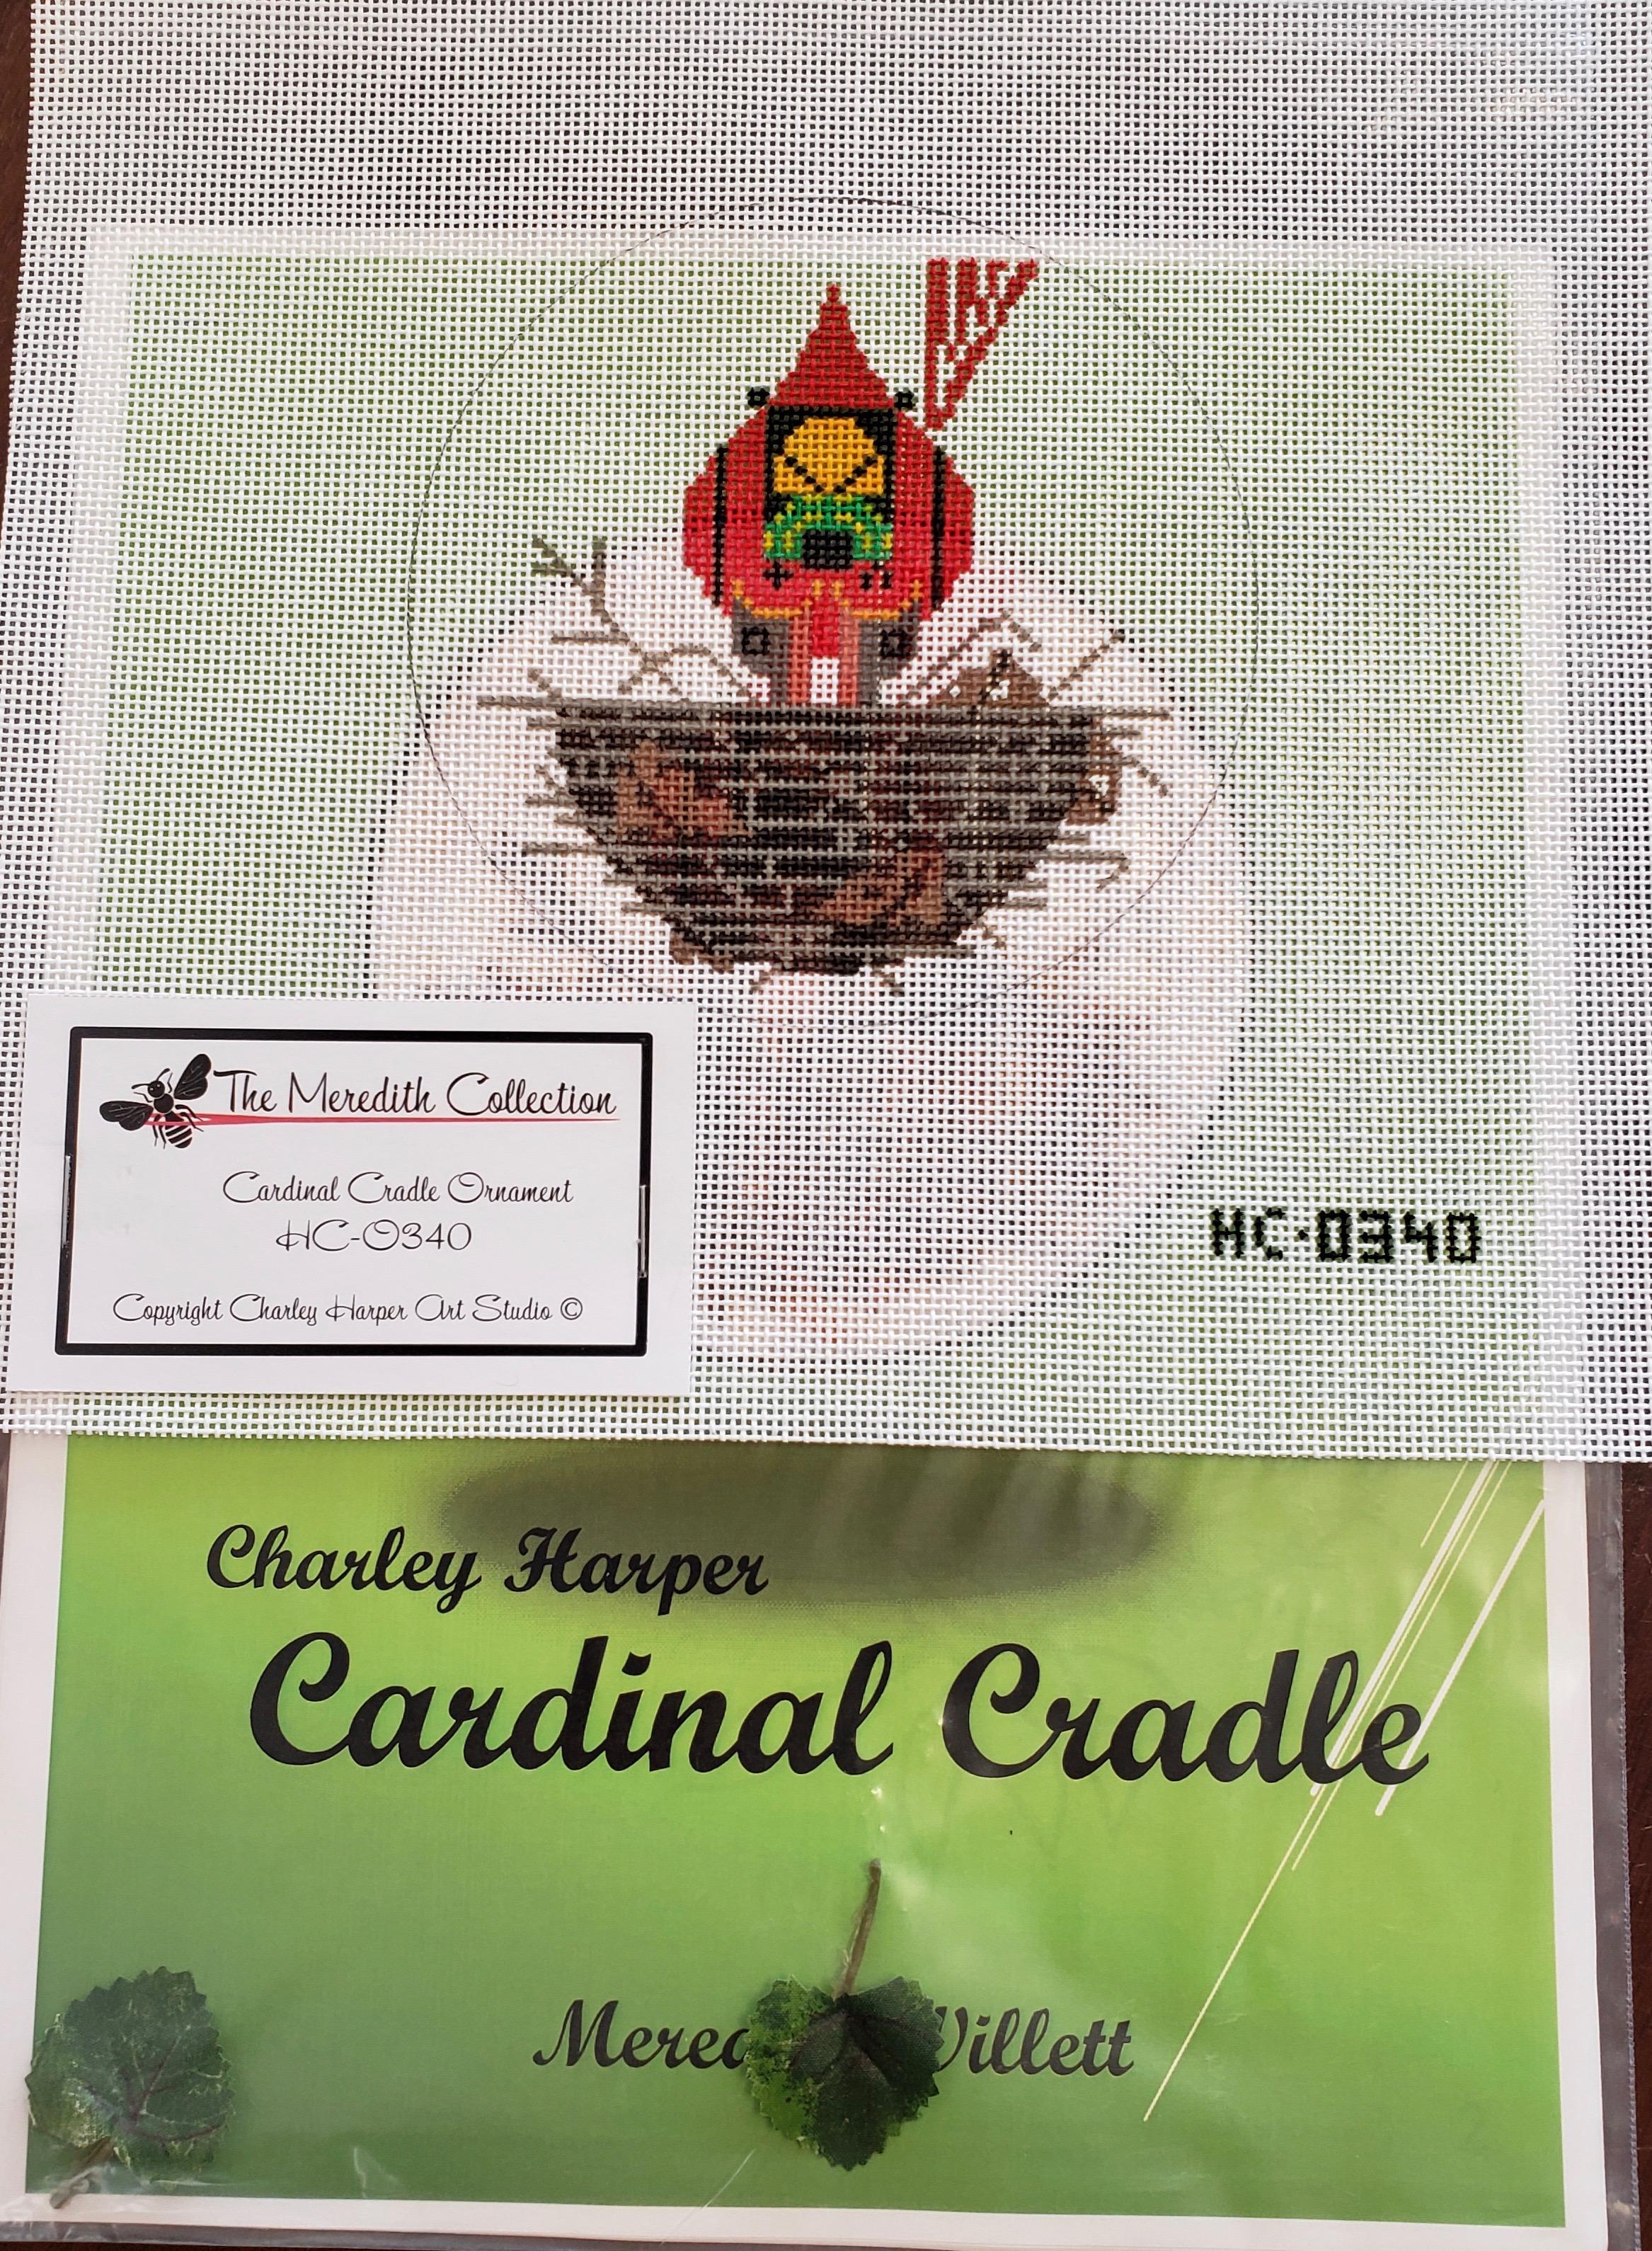 Cardinal Cradle Ornament & Stitch Guide